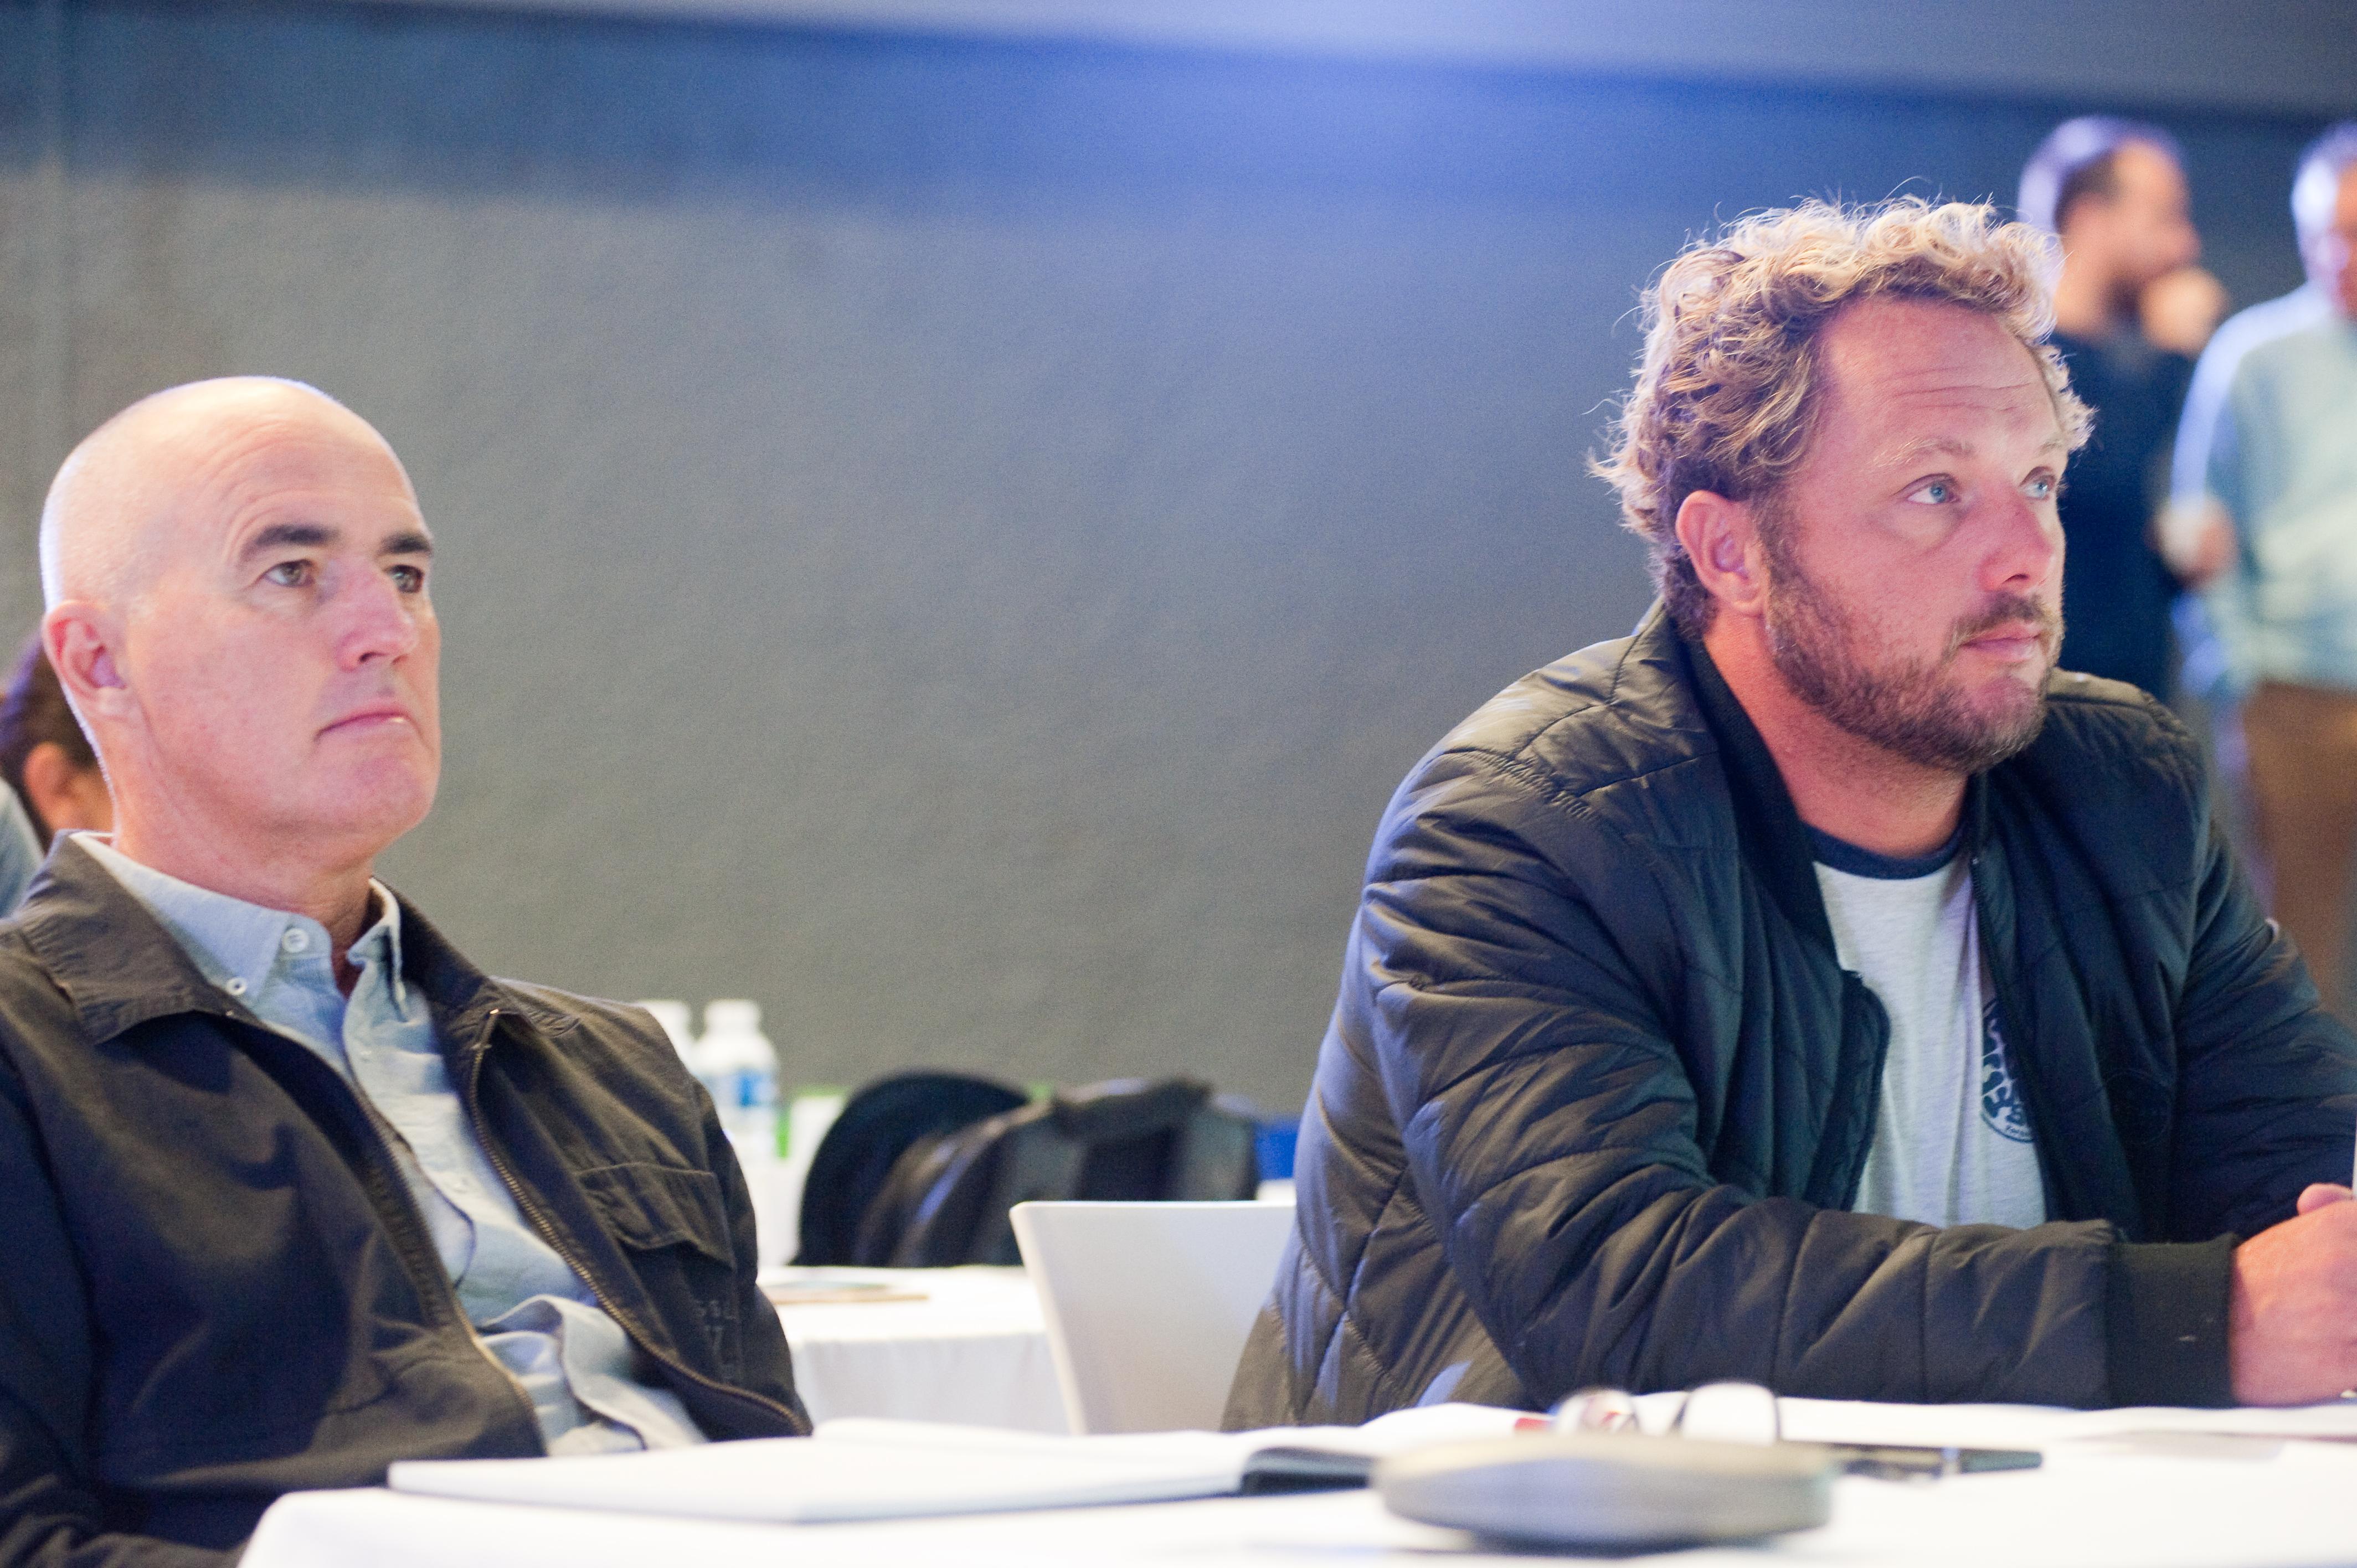 Derek Oäó»Neill (Vissla General Manager) and Wilco Prins (Rip Curl Europe General Manager and EuroSIMA President) - Photos courtesy of EuroSIMA